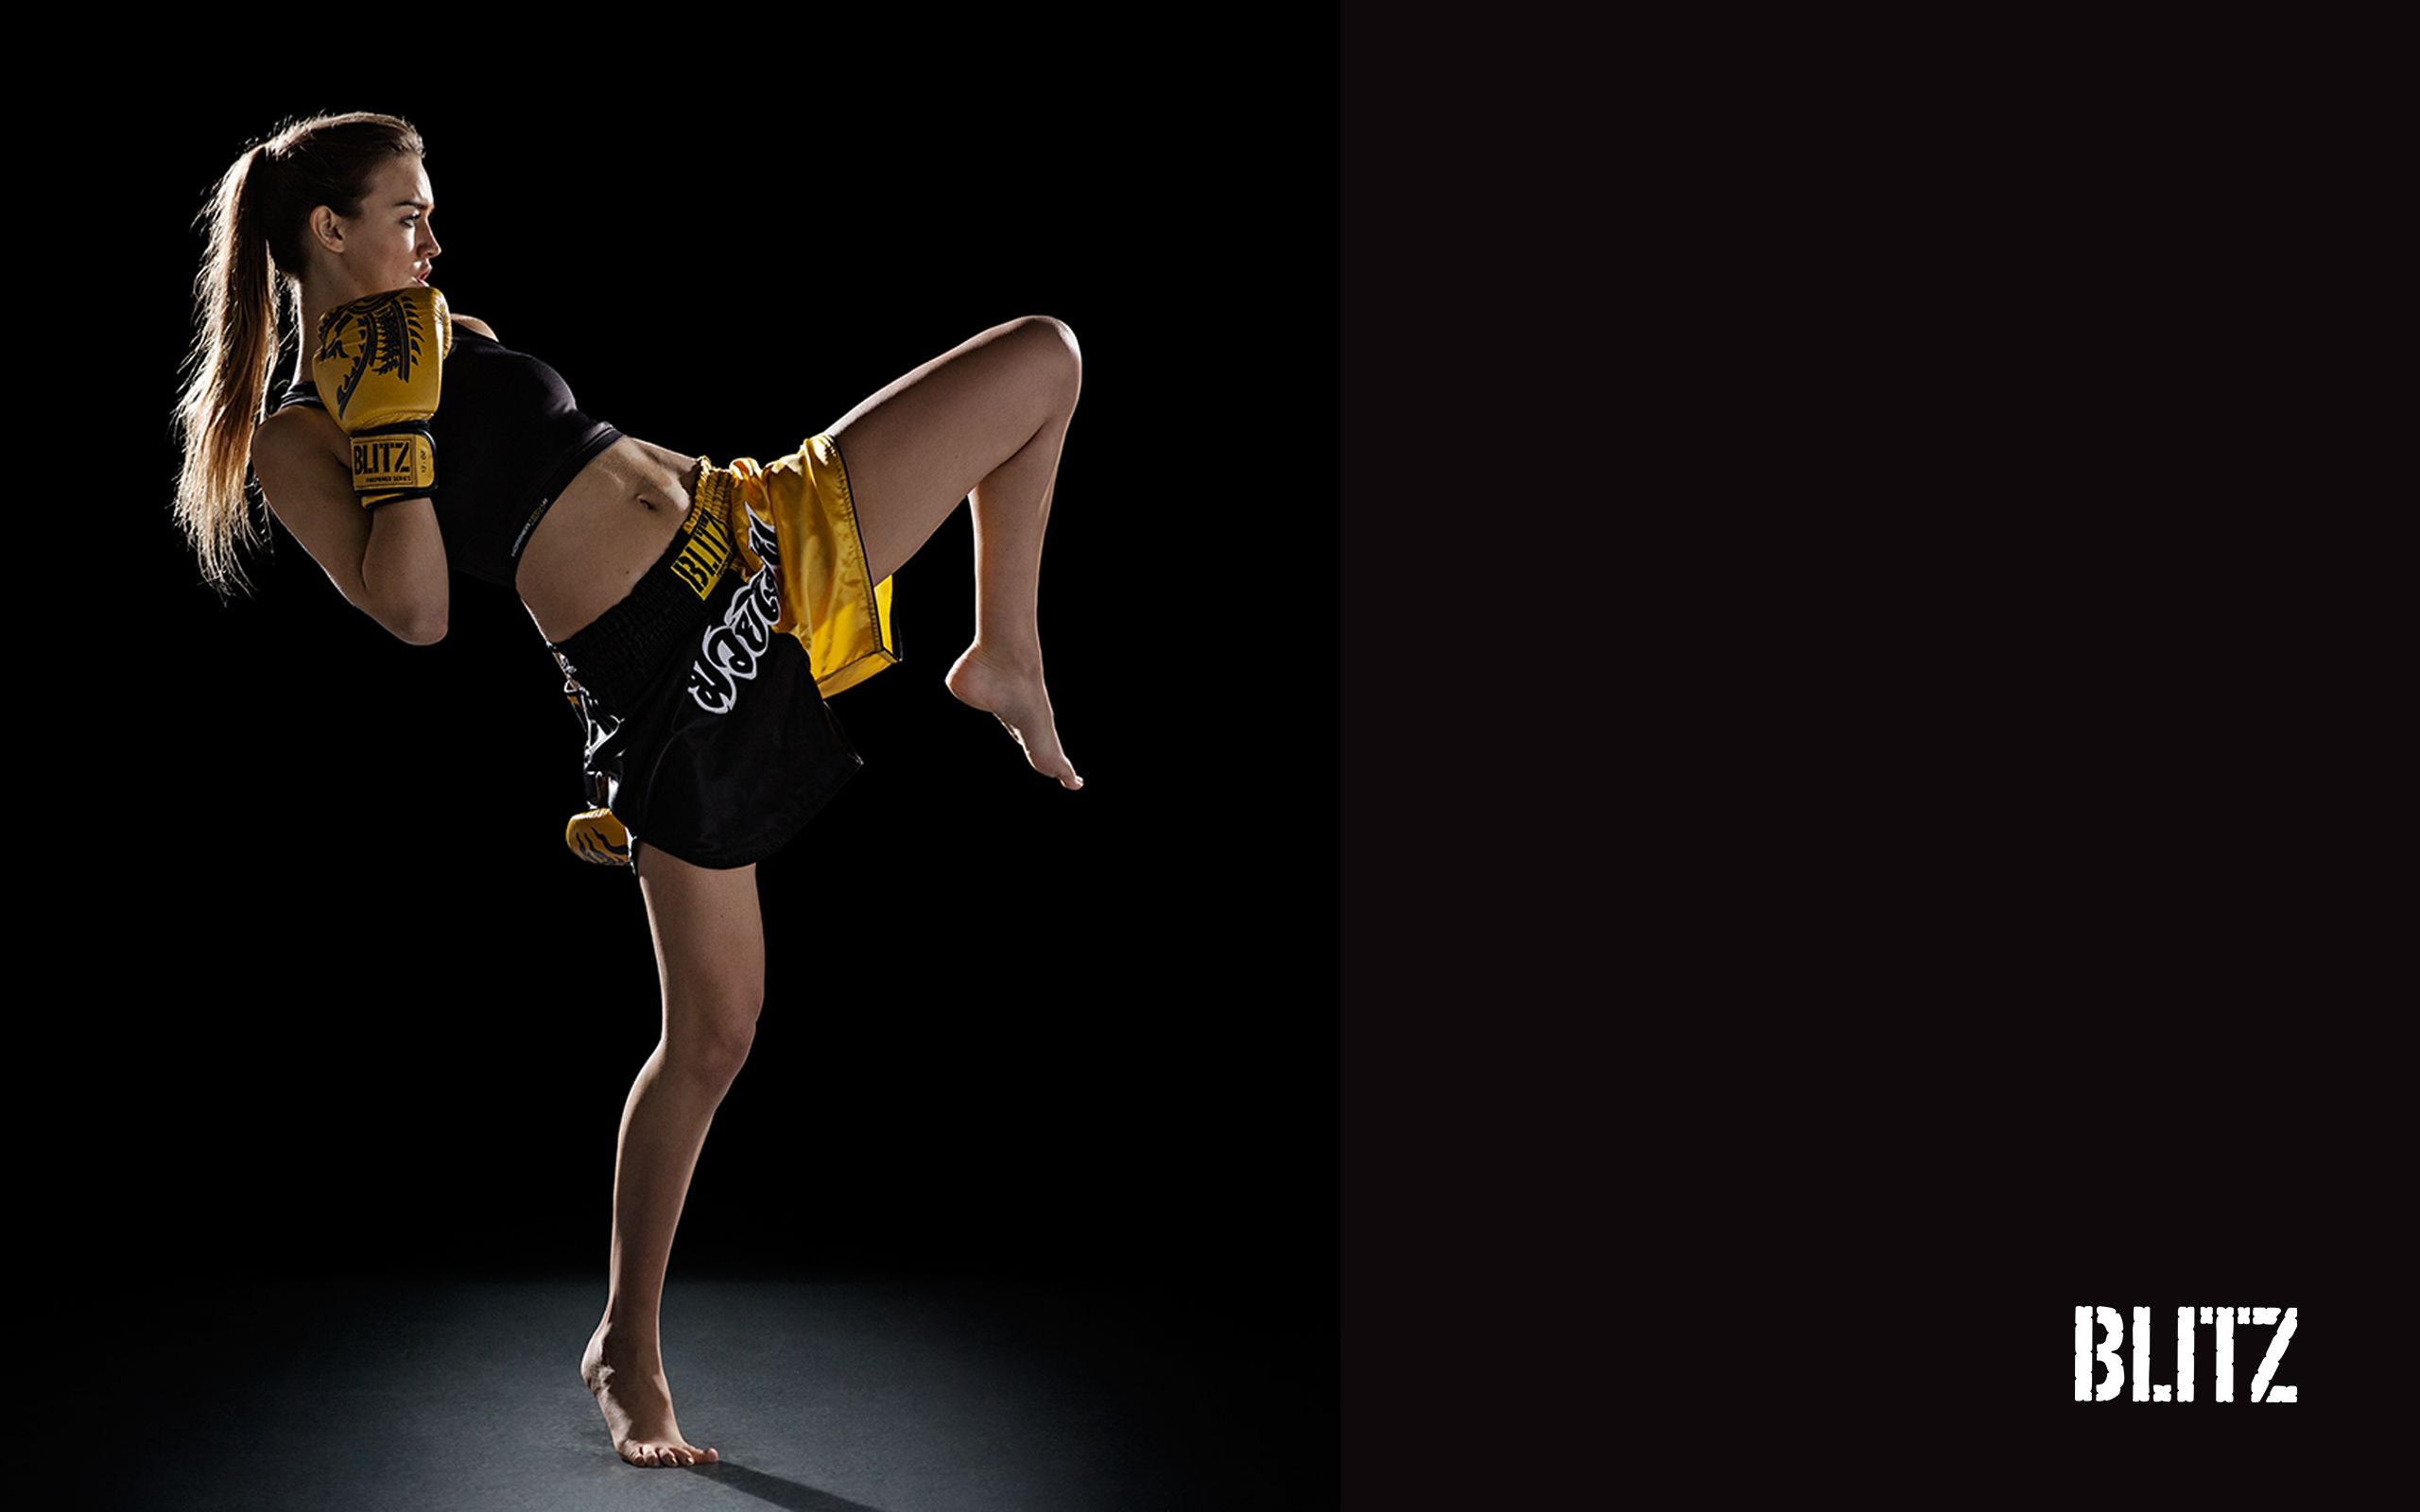 Muay Thai aka Thai Kickboxing blitz wallpaper muaythai 2560x1600